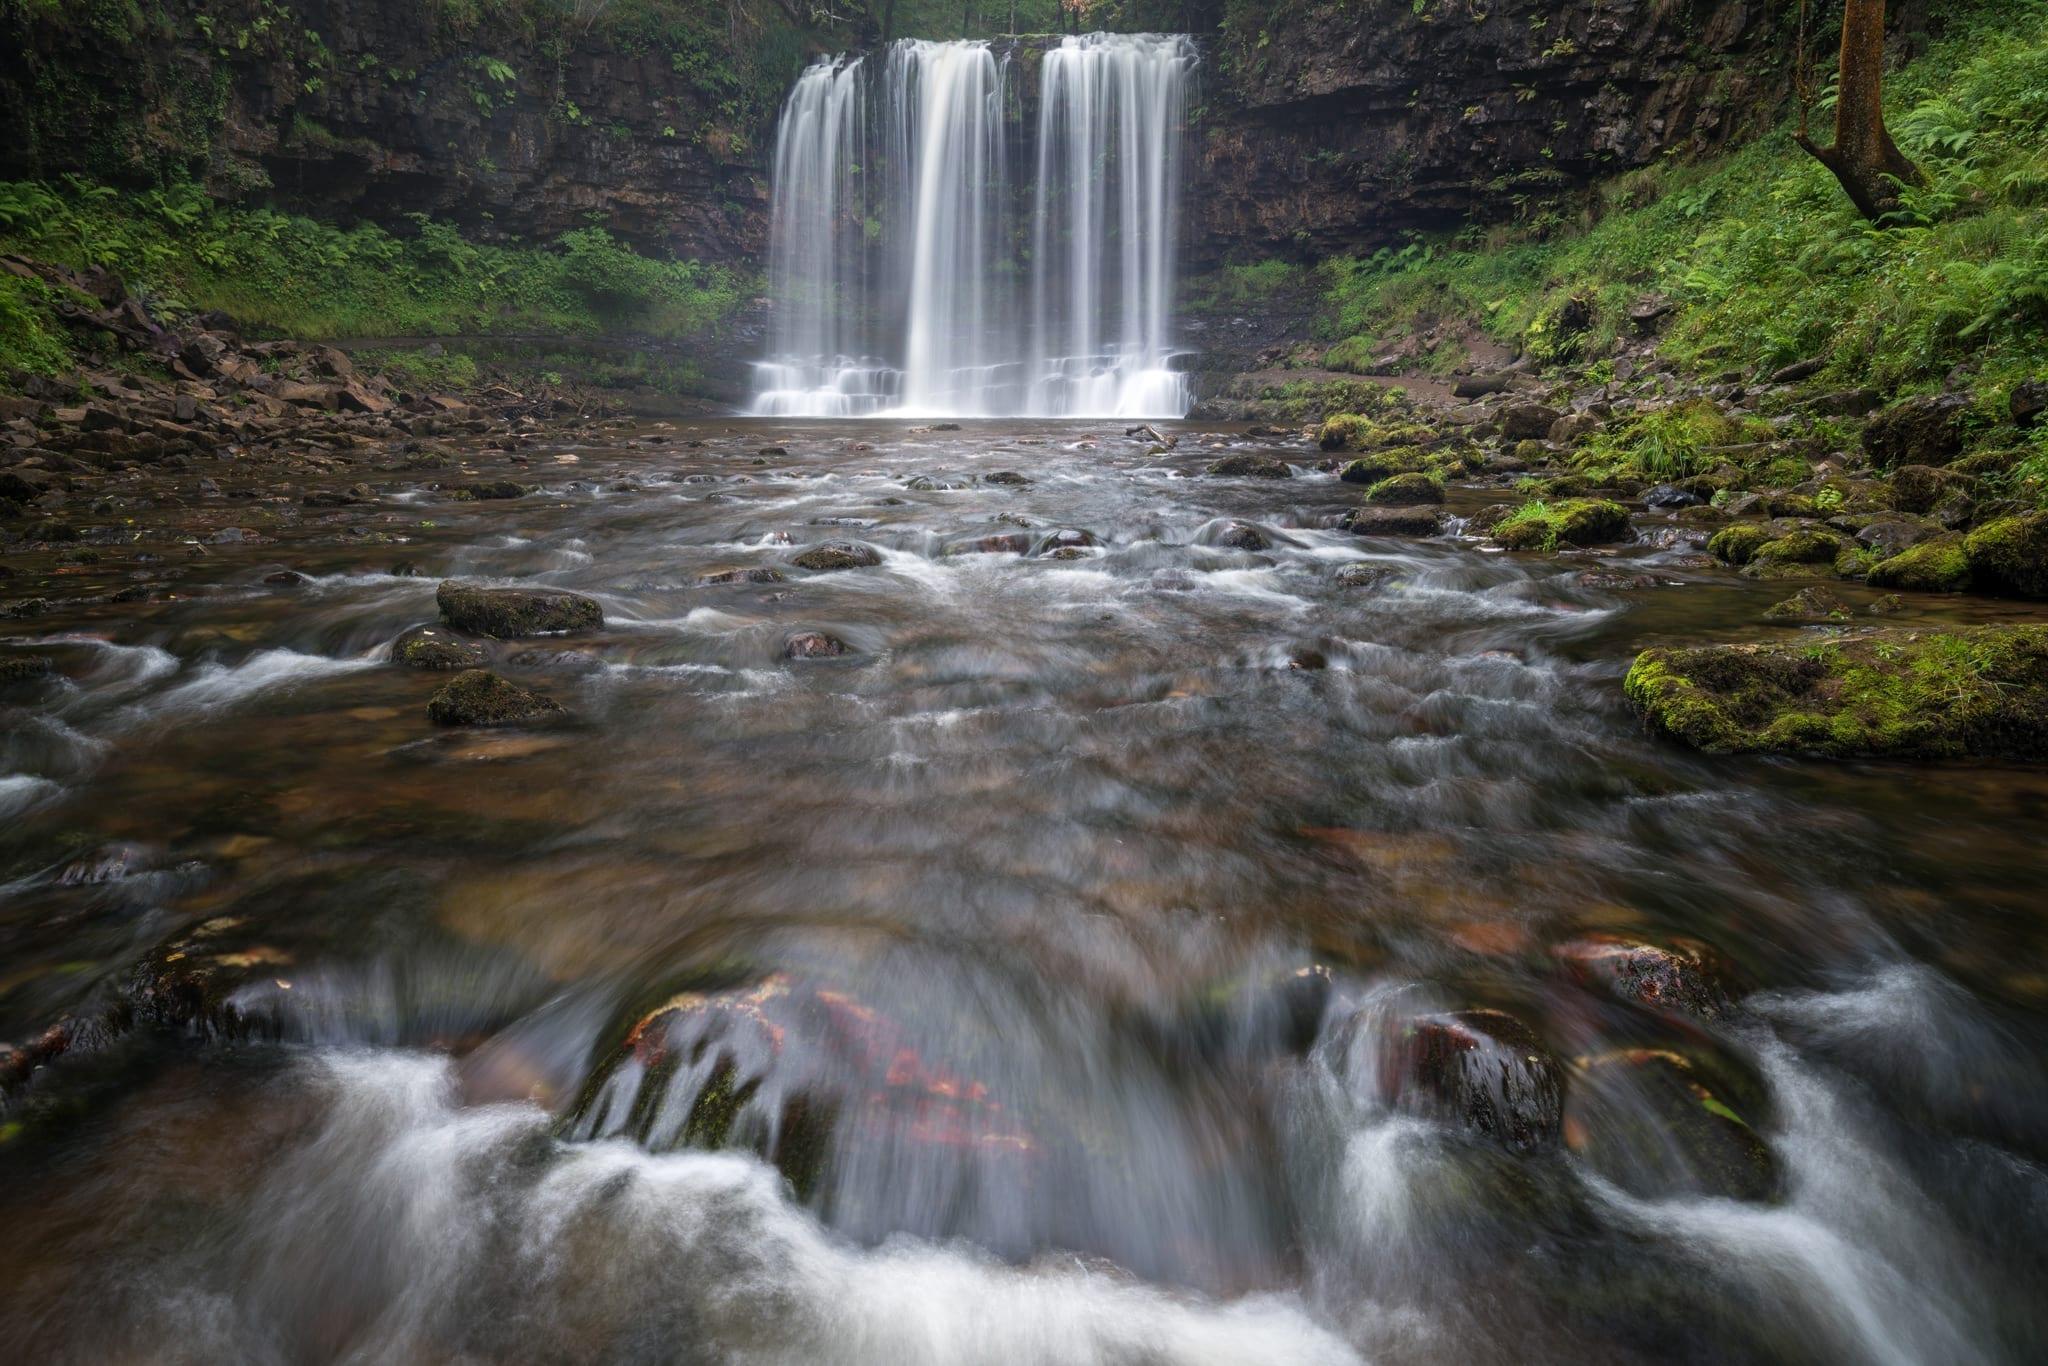 Sgwd Yr Eira Waterfall - Brecon Beacons Waterfall